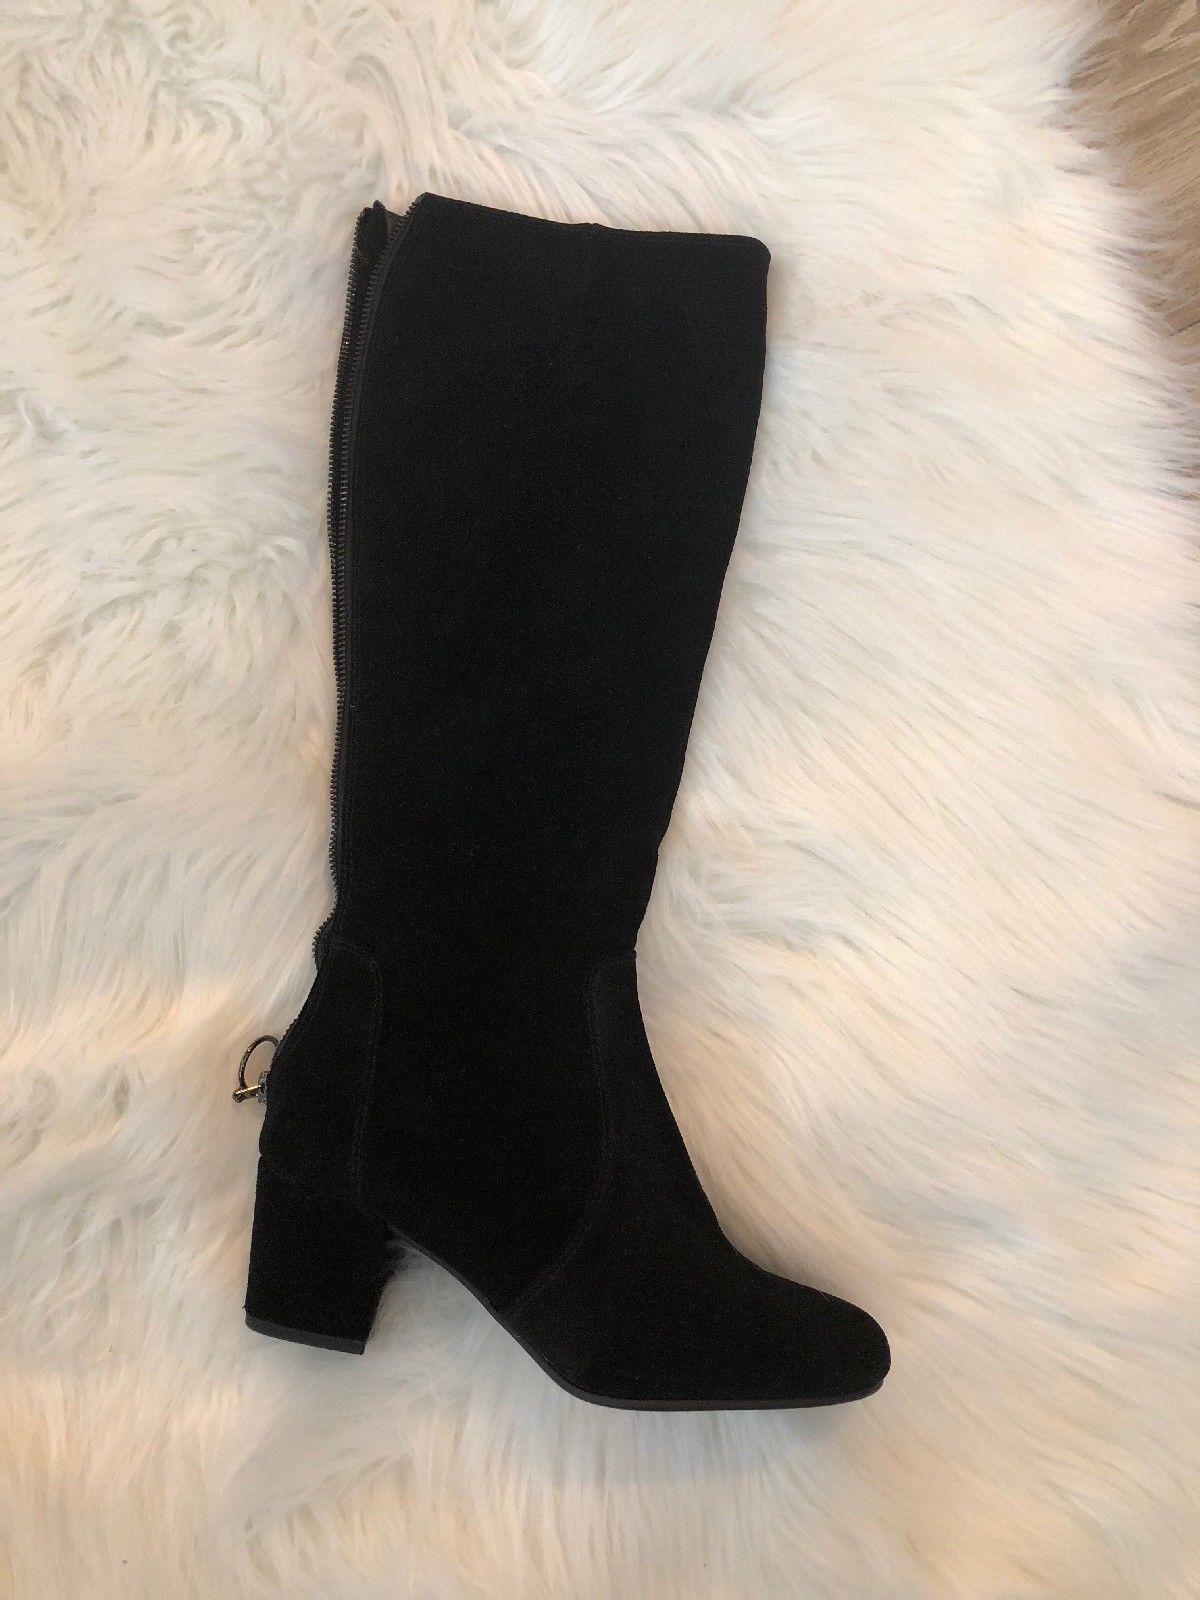 6d84fc20339 Steve Madden New Haydun Black Boots size 8 and 50 similar items